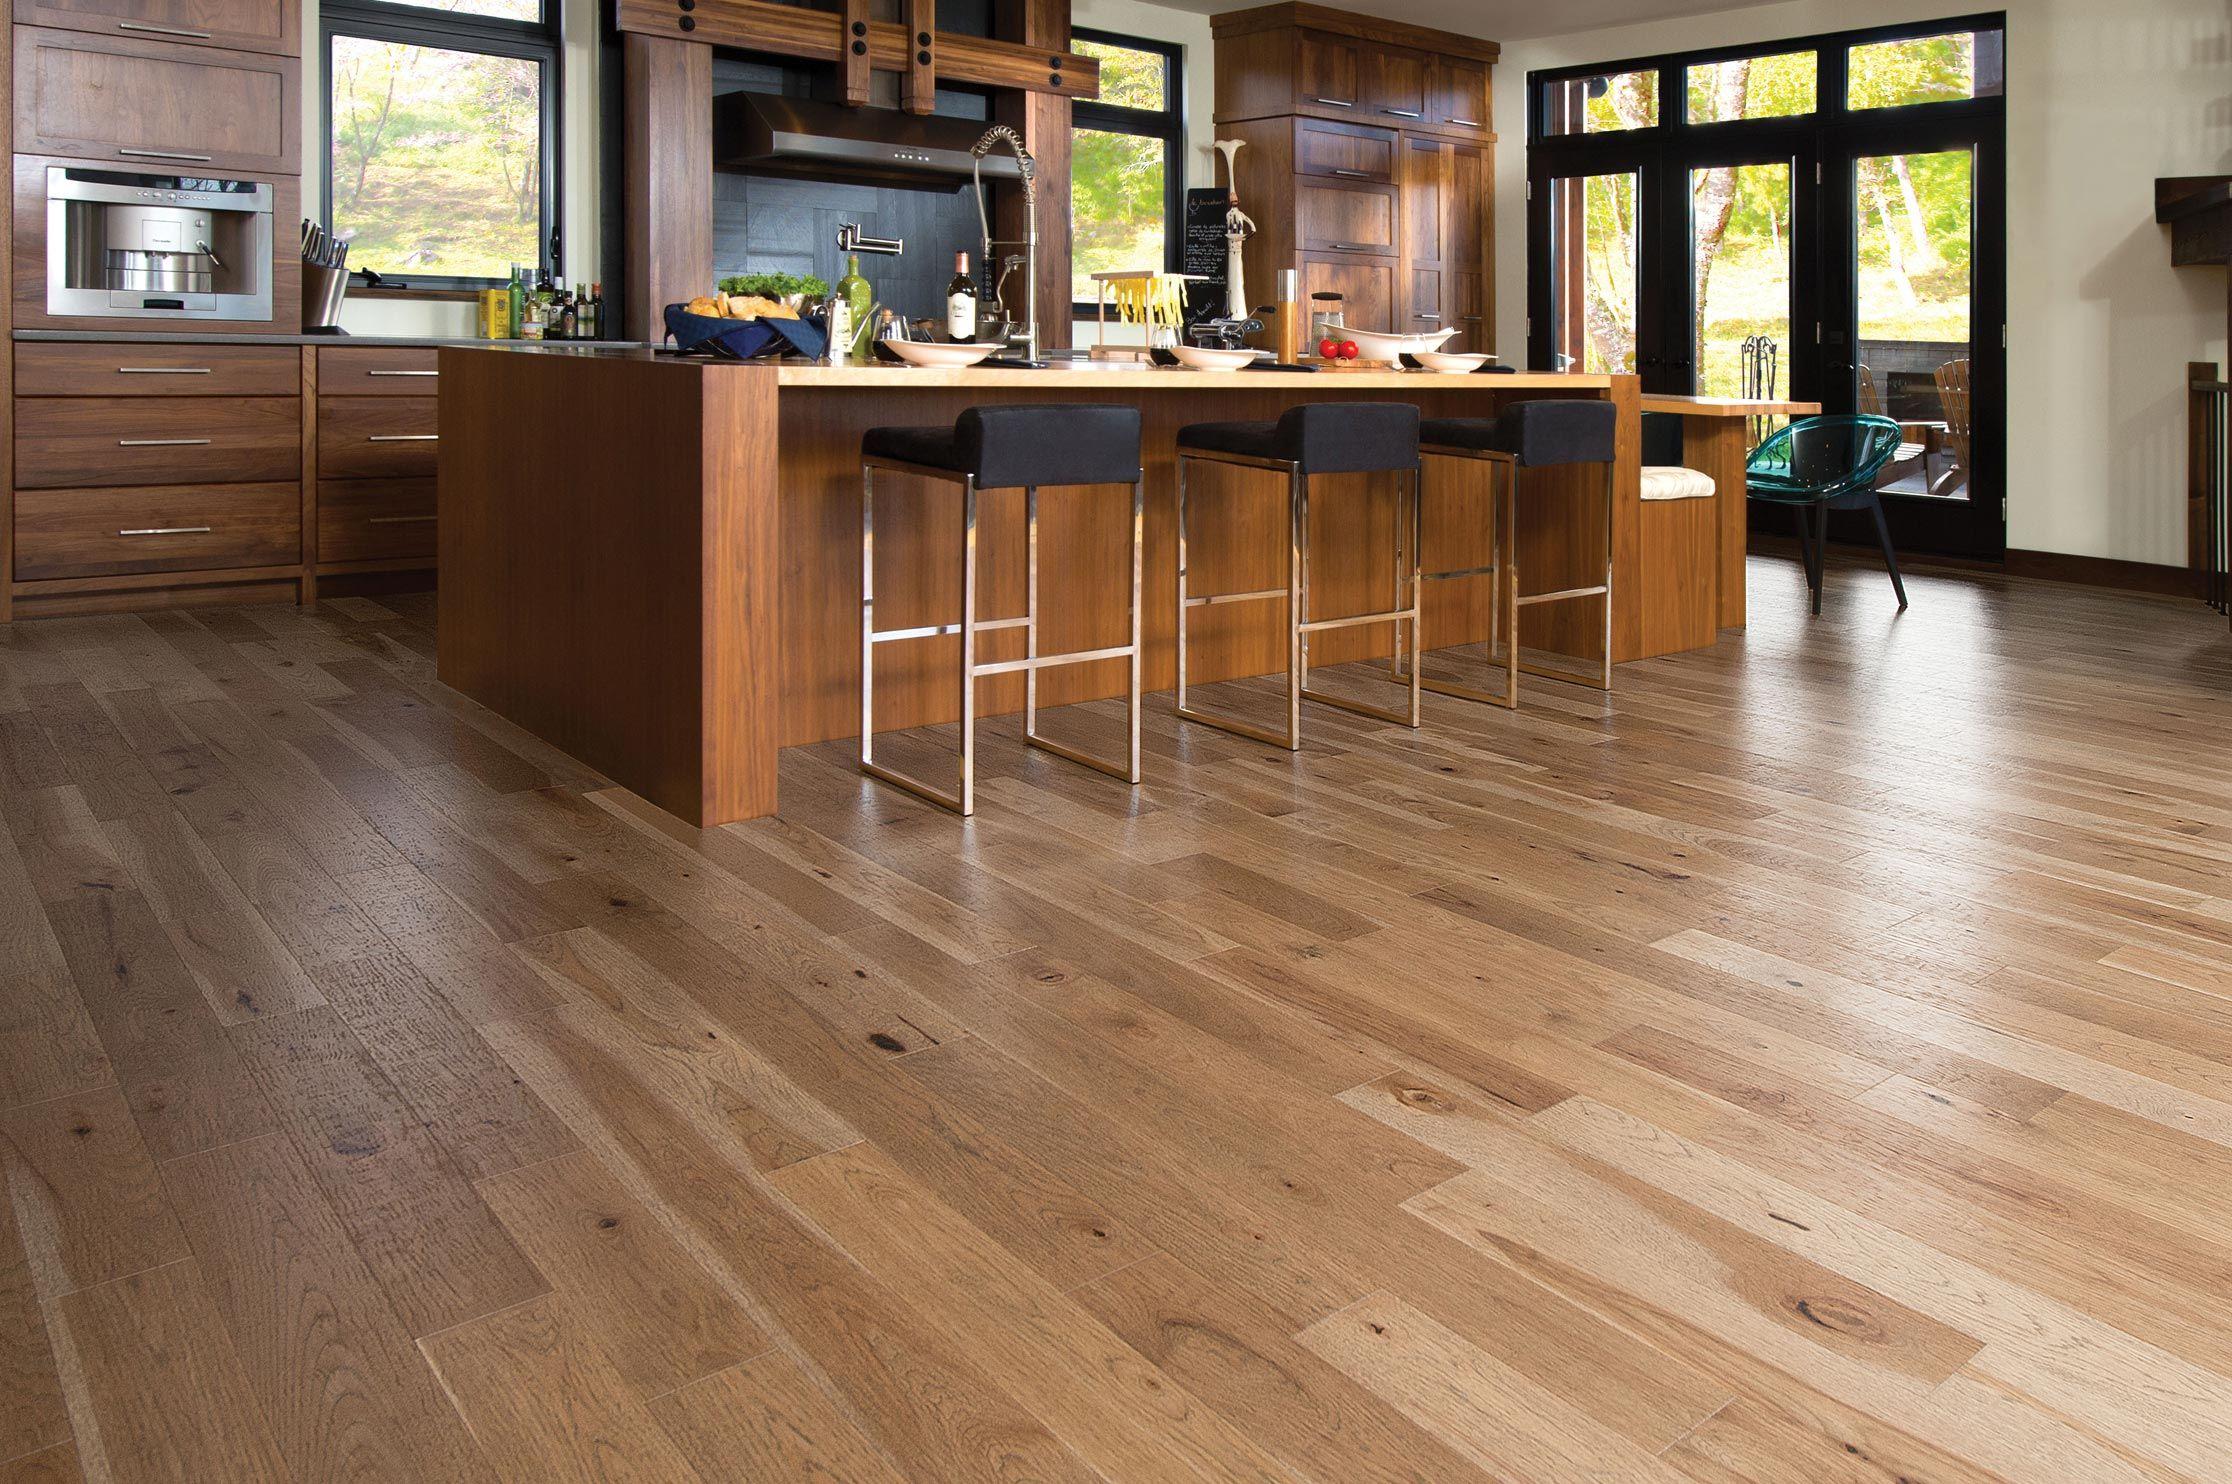 Mirage Hardwood flooring photo album Mirage Floors Old